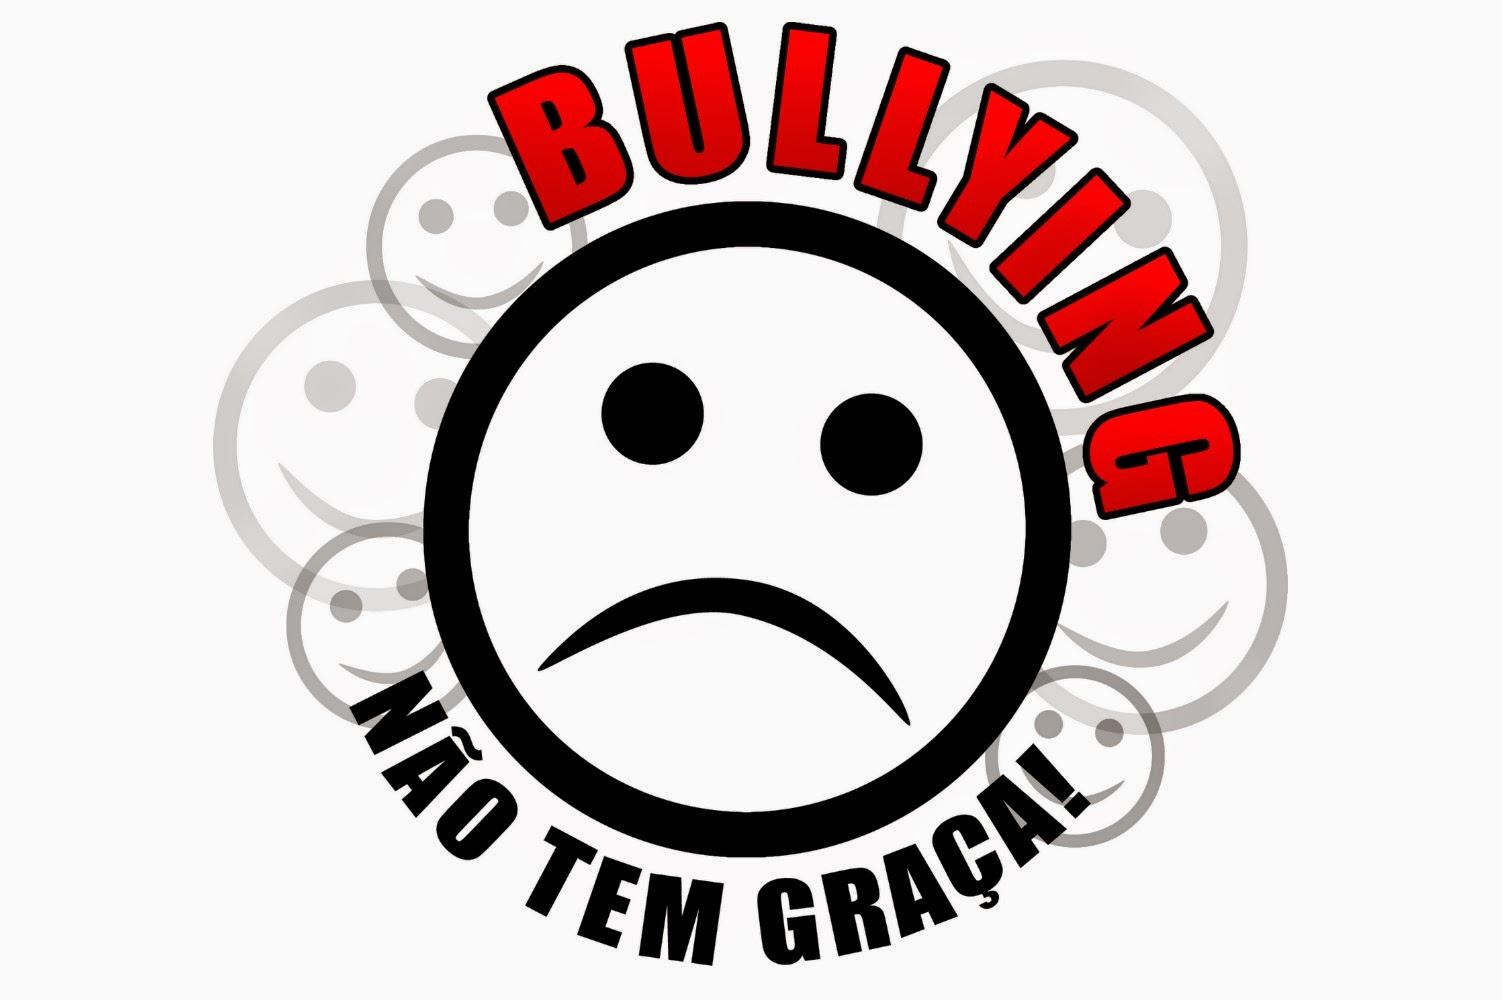 Bullying - o que é e como identificar